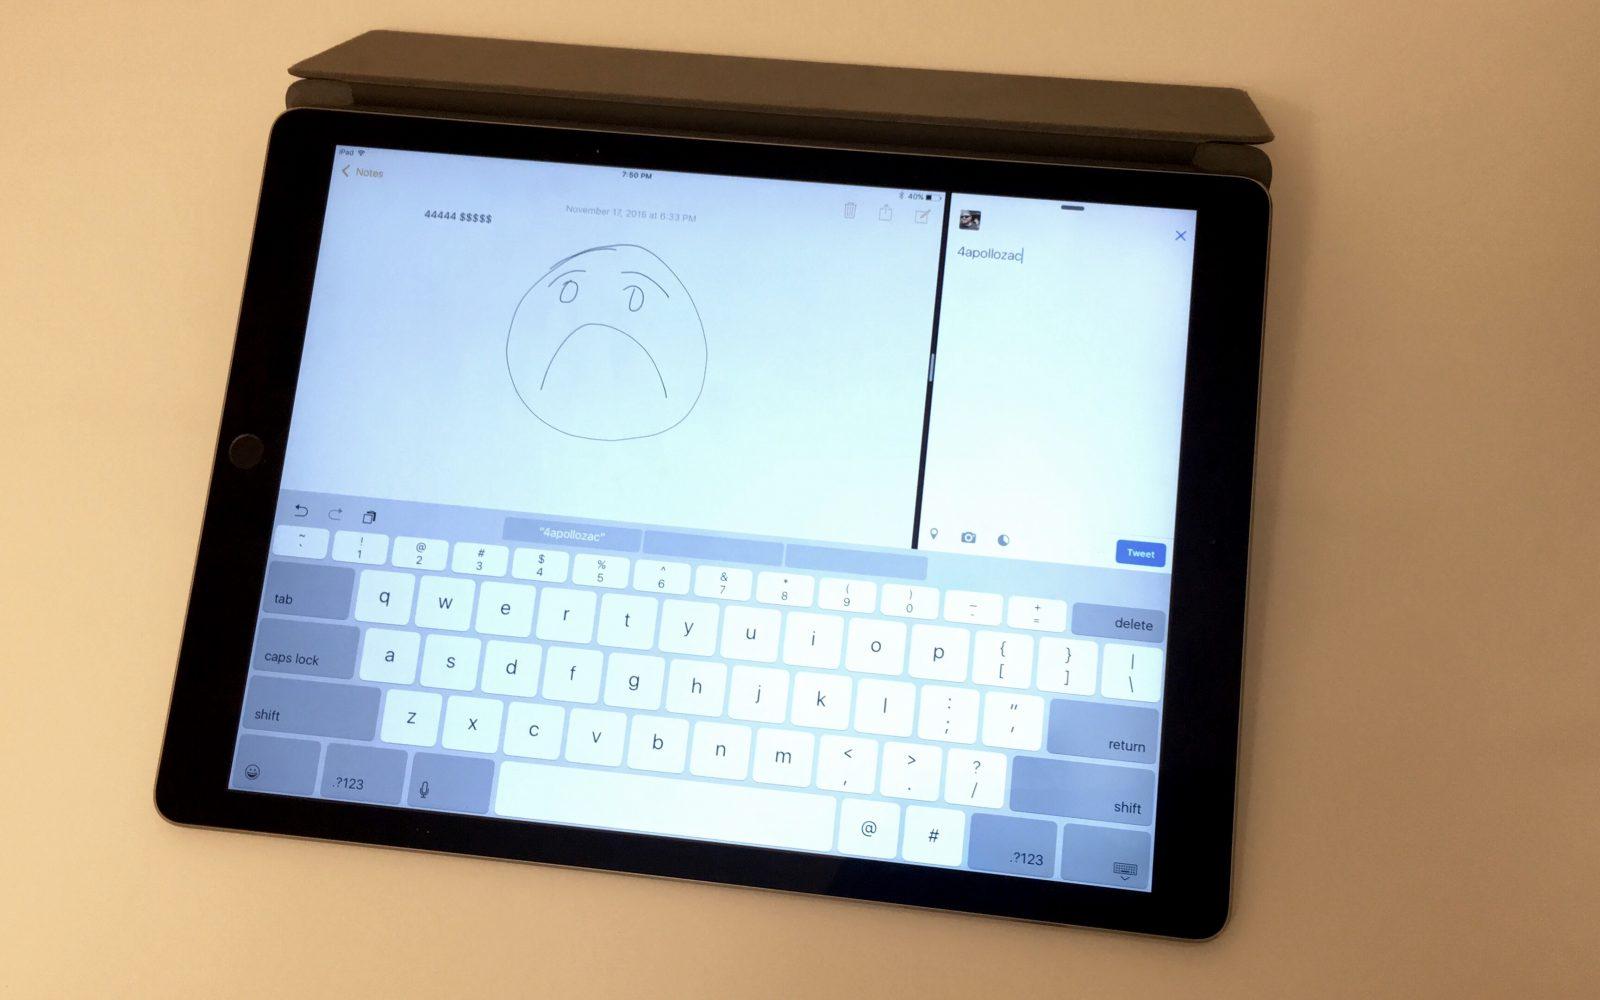 Ipad Pros Keyboard Has An Annoying Shift Key Bug Heres How To Fix